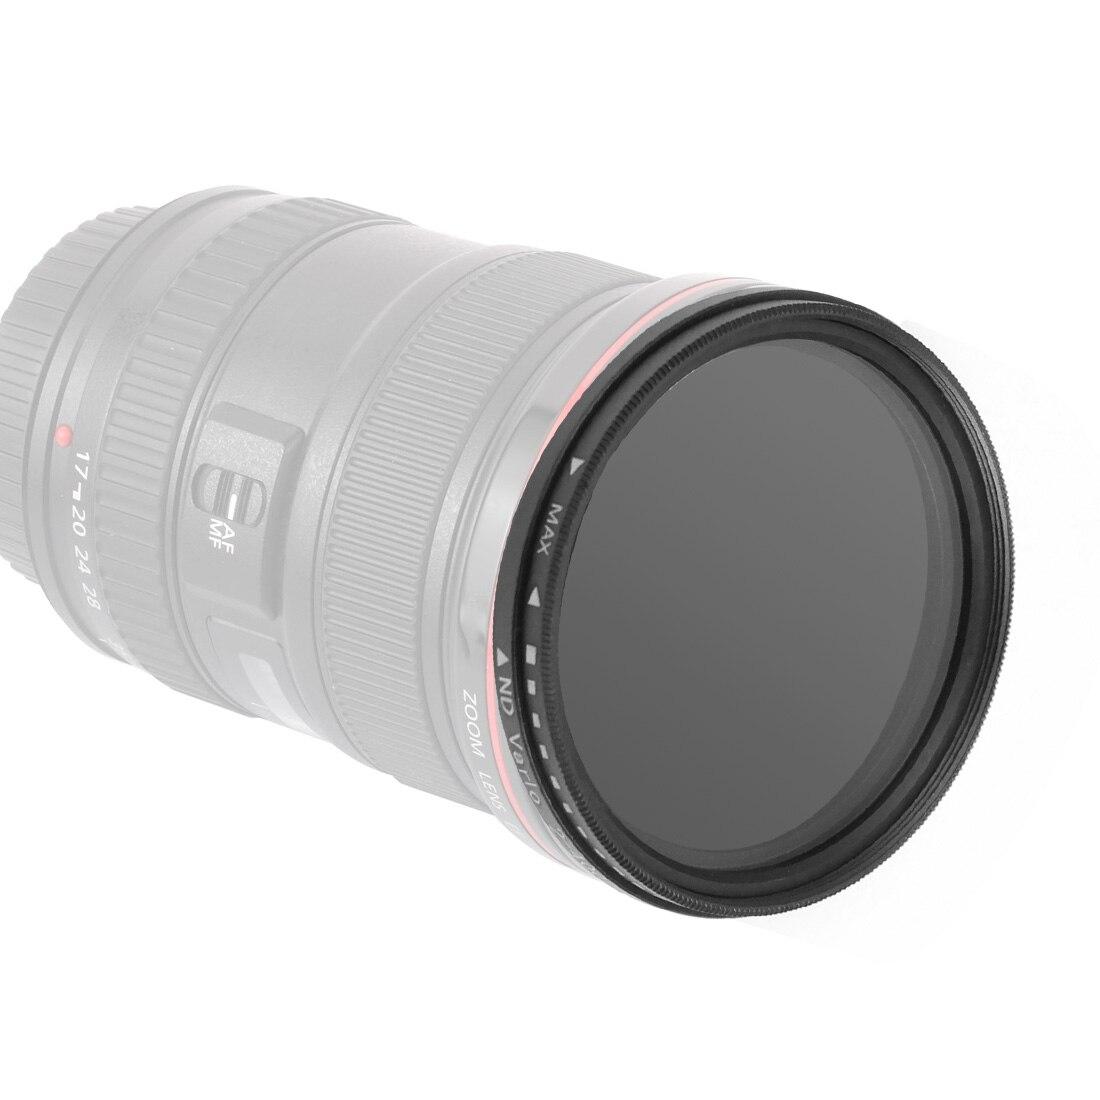 BGNing Camera Filter Lenses ND2-400 Neutral Density Fader Variable ND Filters Adjustable For Canon For Nikon 52/58/62/72/77/82mm